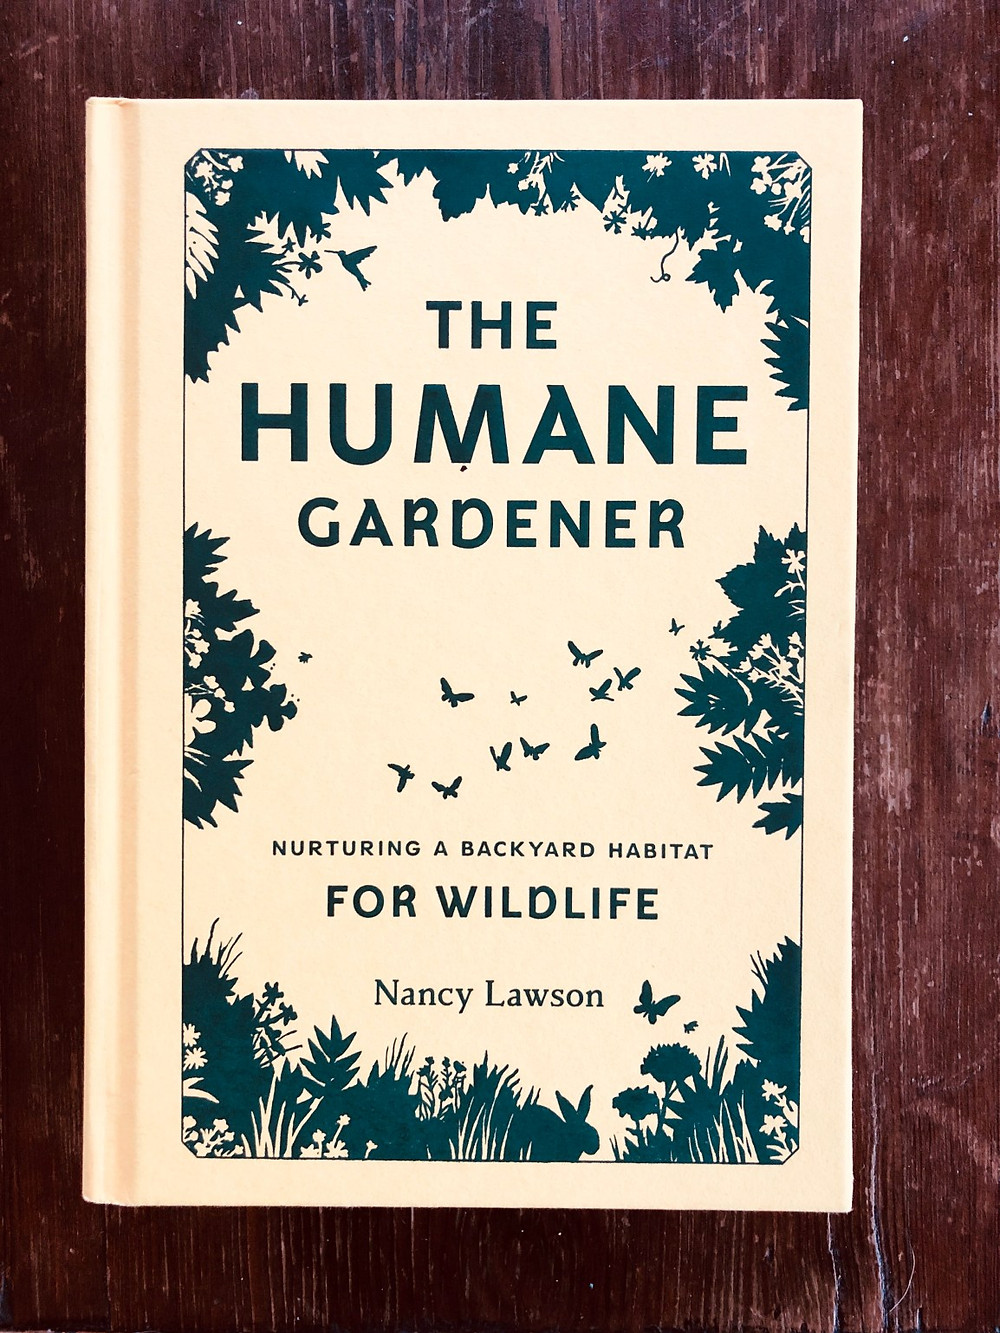 TheHumaneGardener cover